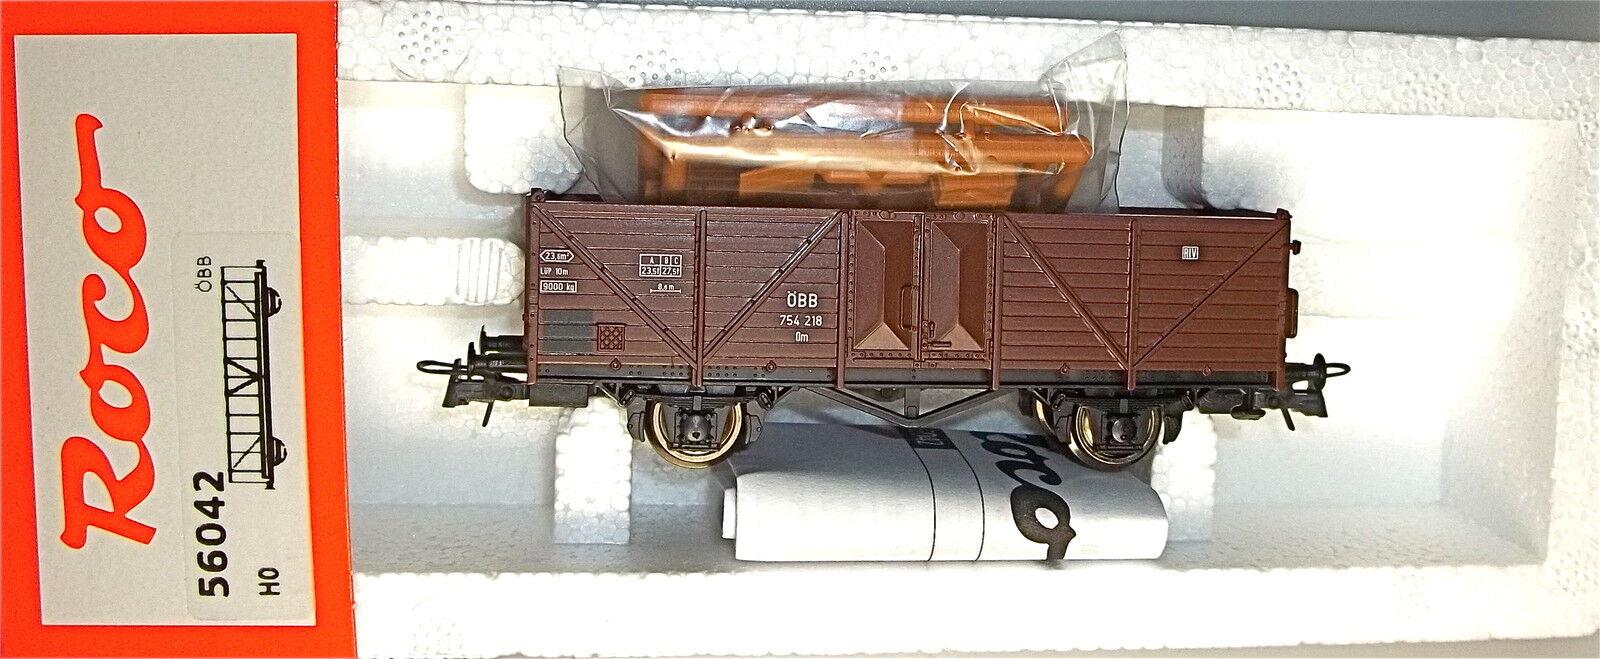 0m ÖBB 754 218 wagons avec charge ROCO 56042 H0 1 87 NEUF et emballé  HC2